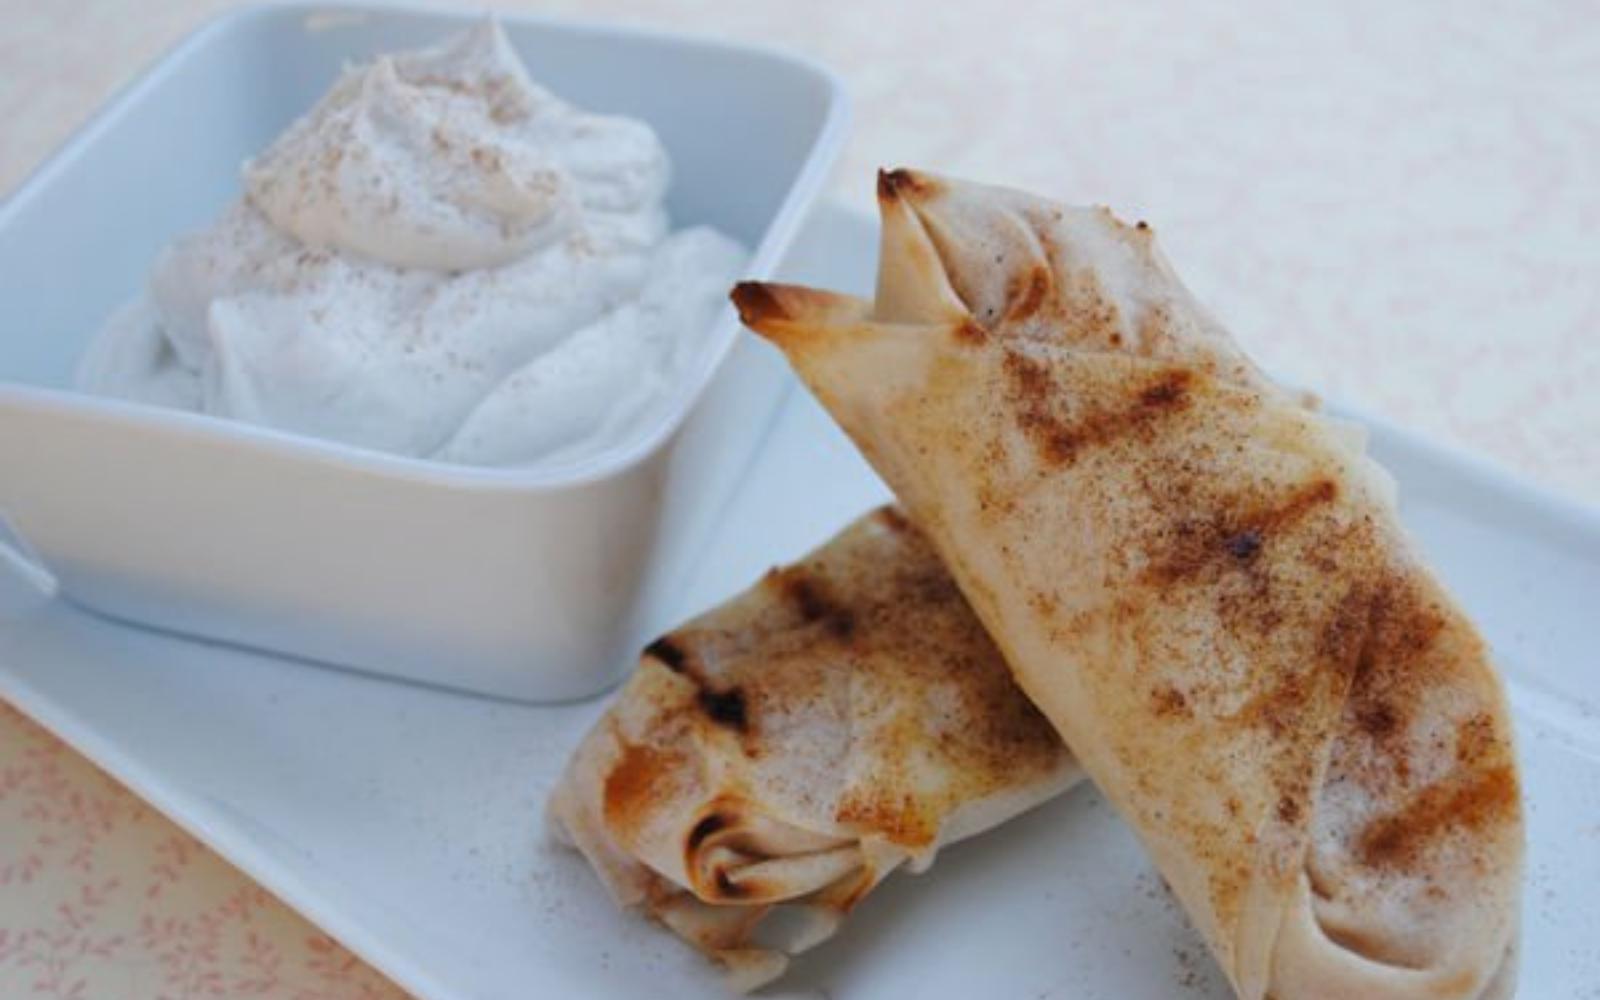 Vegan Coconut Vanilla Whipped Cream